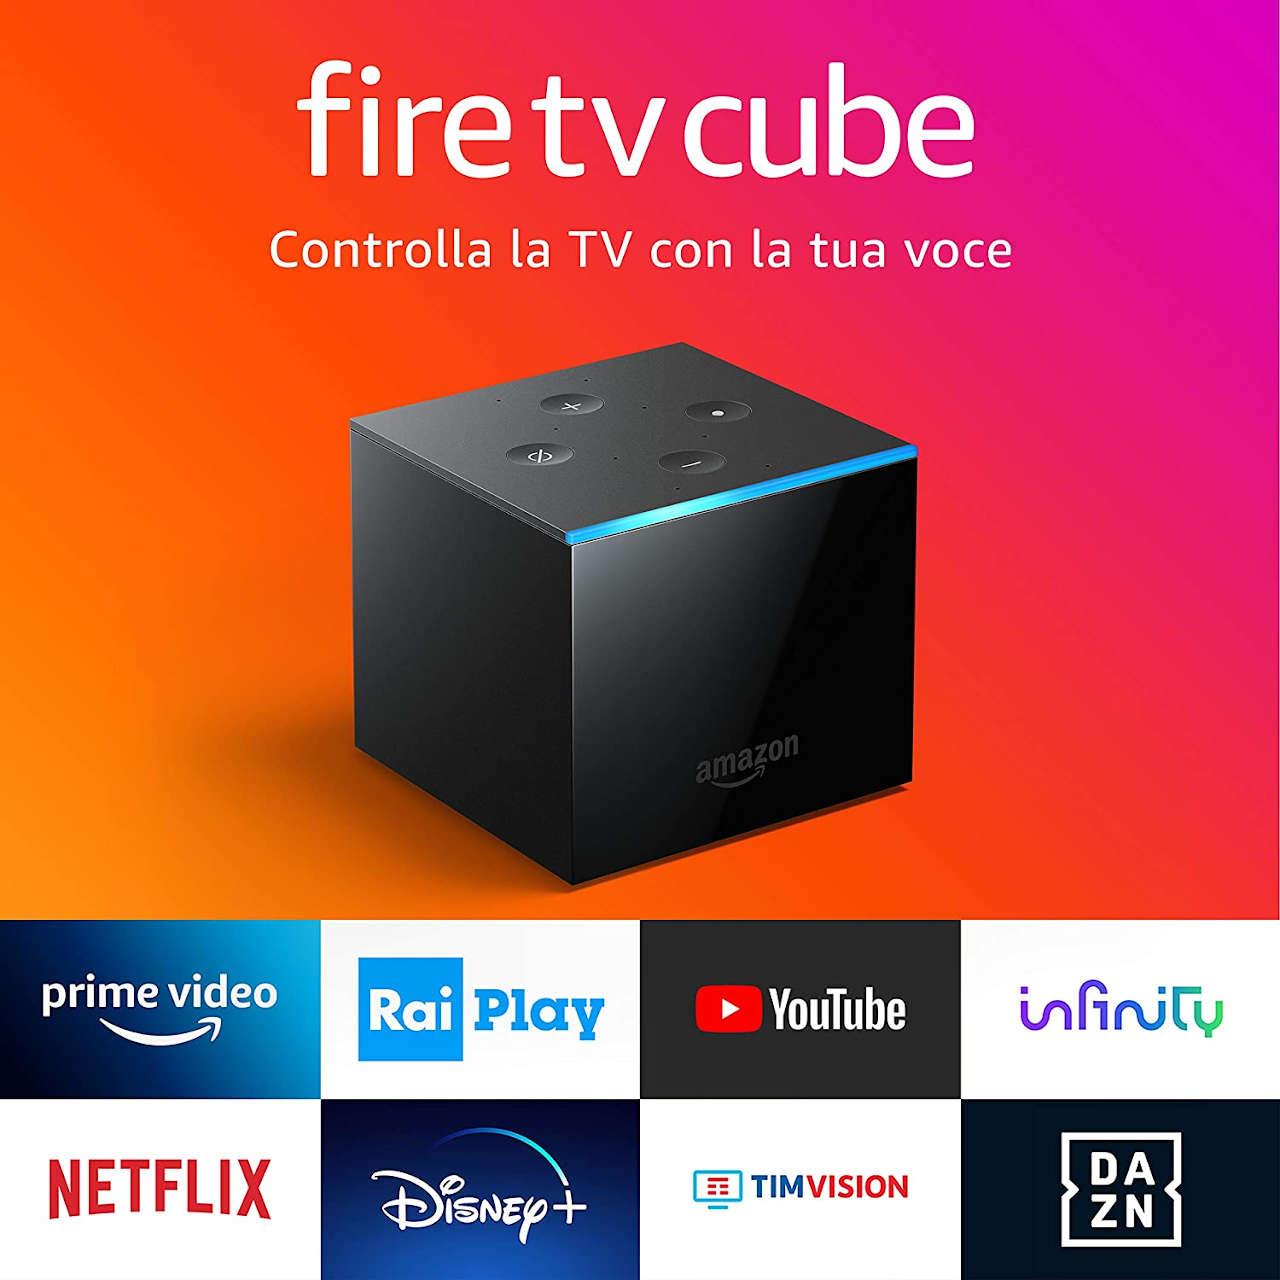 amazon fire cube